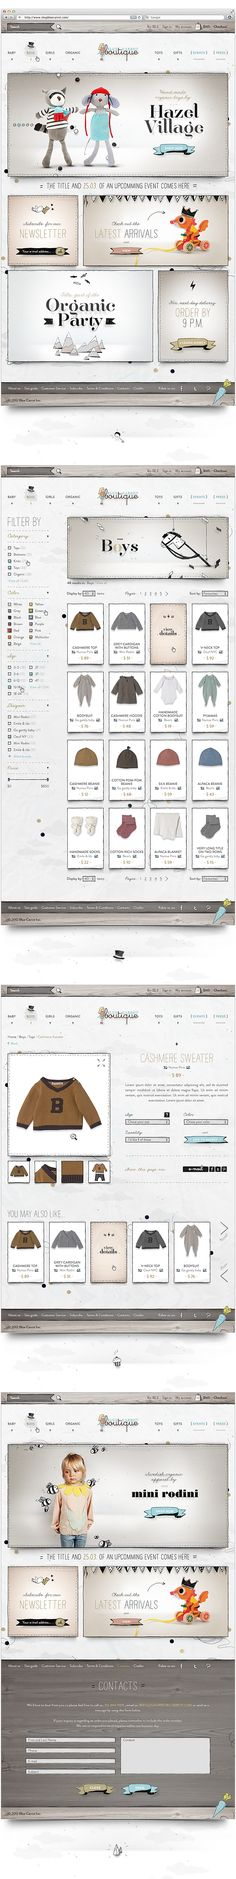 Web design inspiration: texture / paper / whimsical / muted tones | Blue Carrot Boutique | Designer: Stella Petcova